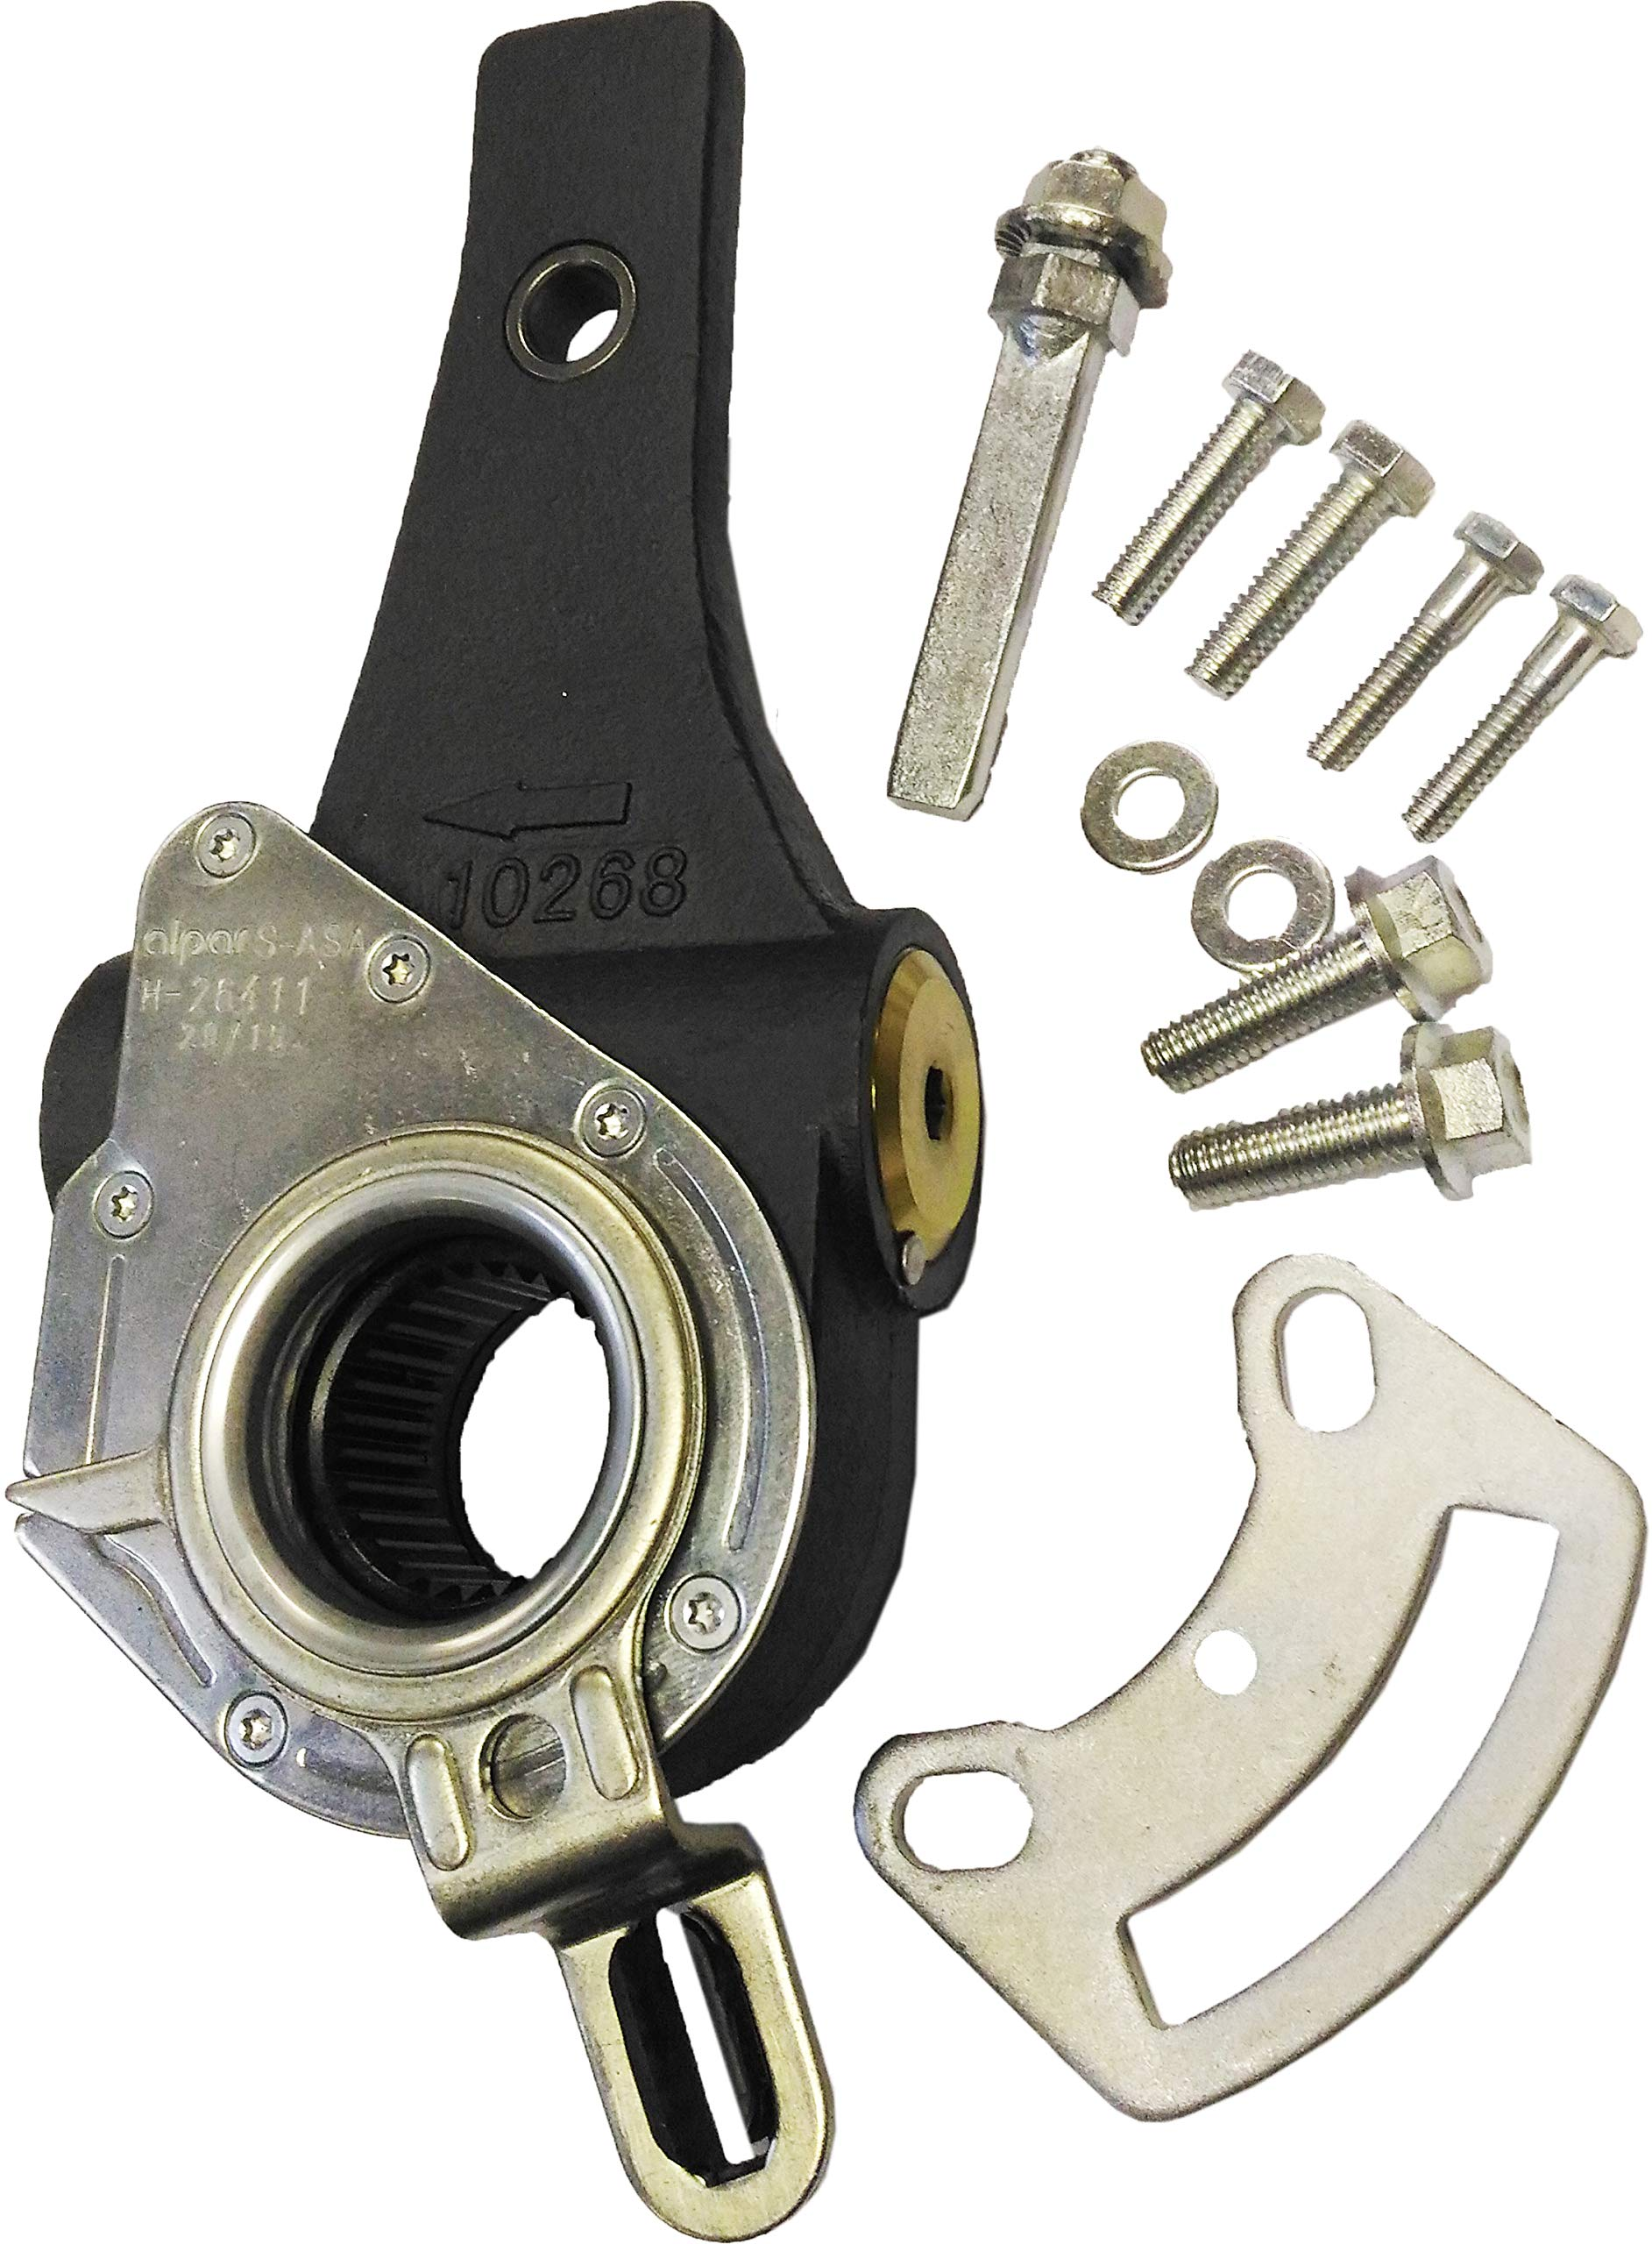 ALPAR H-26413 Haldex Type Automatic Slack Adjuster, Ref-40010213, 37 Spline